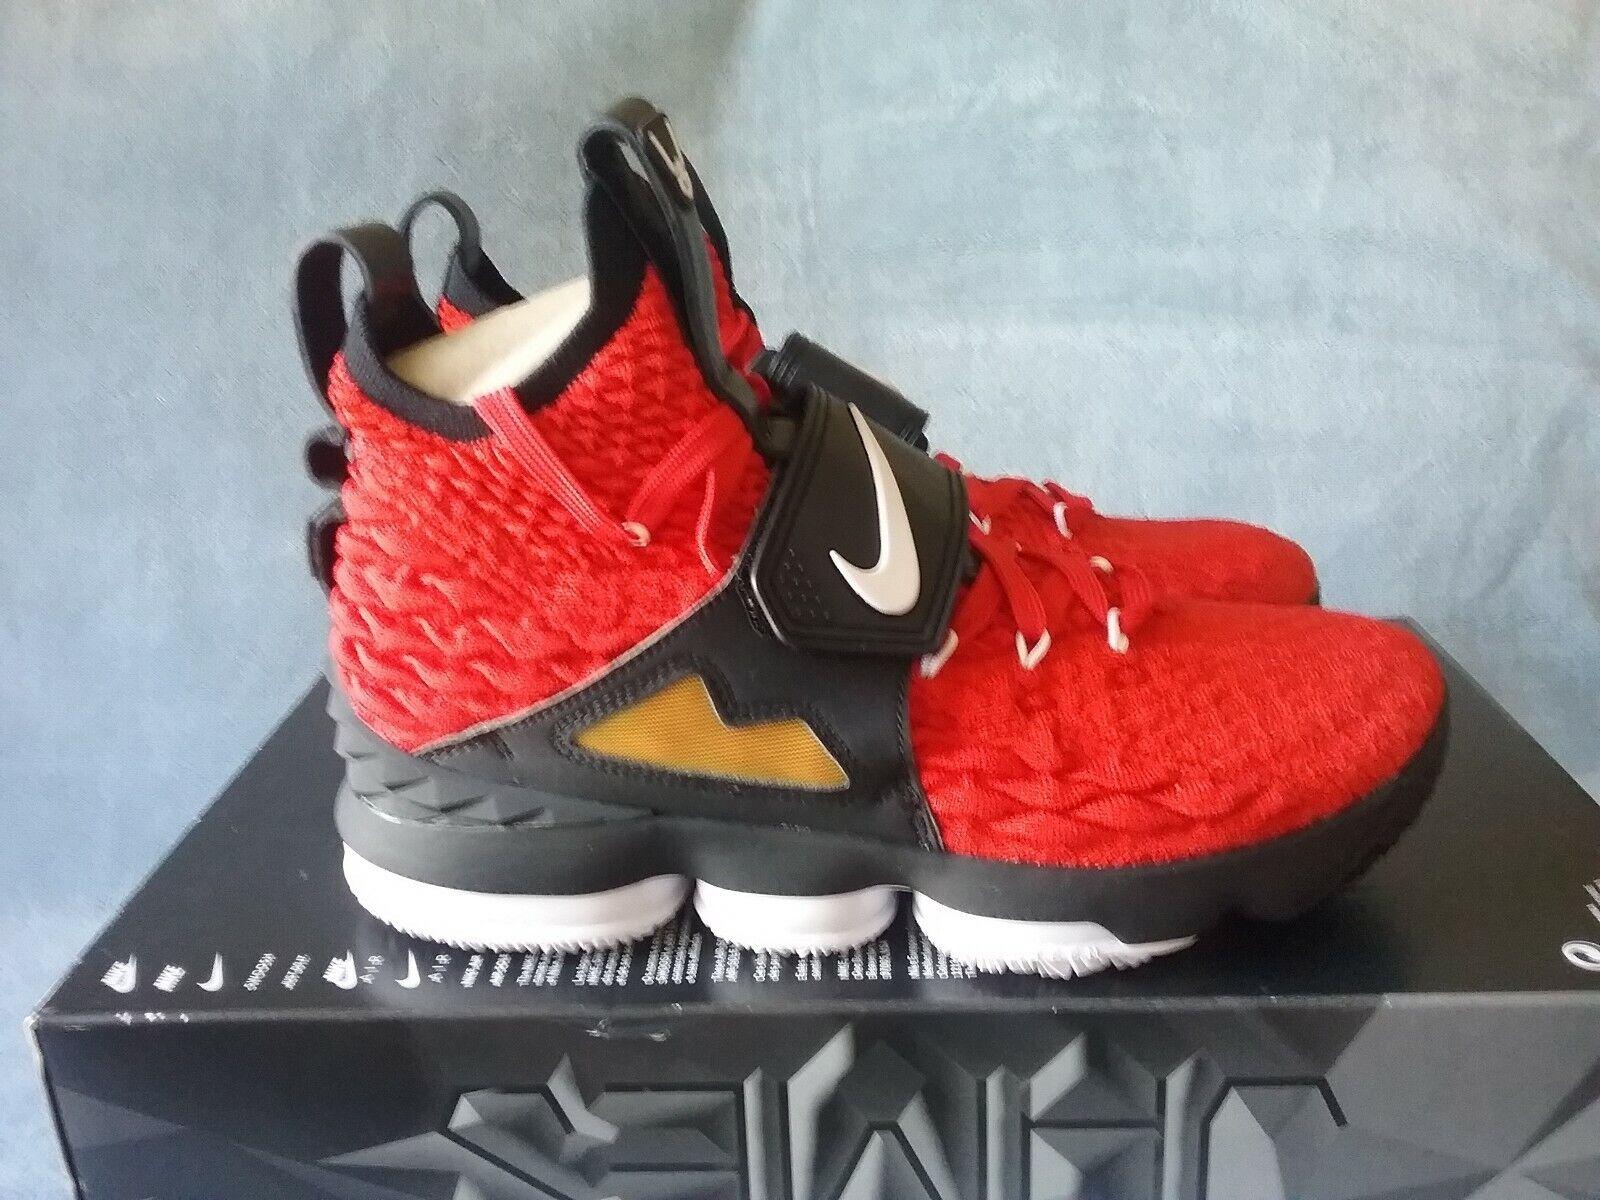 Nike LeBron XV 15 Prime Diamond Turf Deon Sanders AO9144-600 Size 10